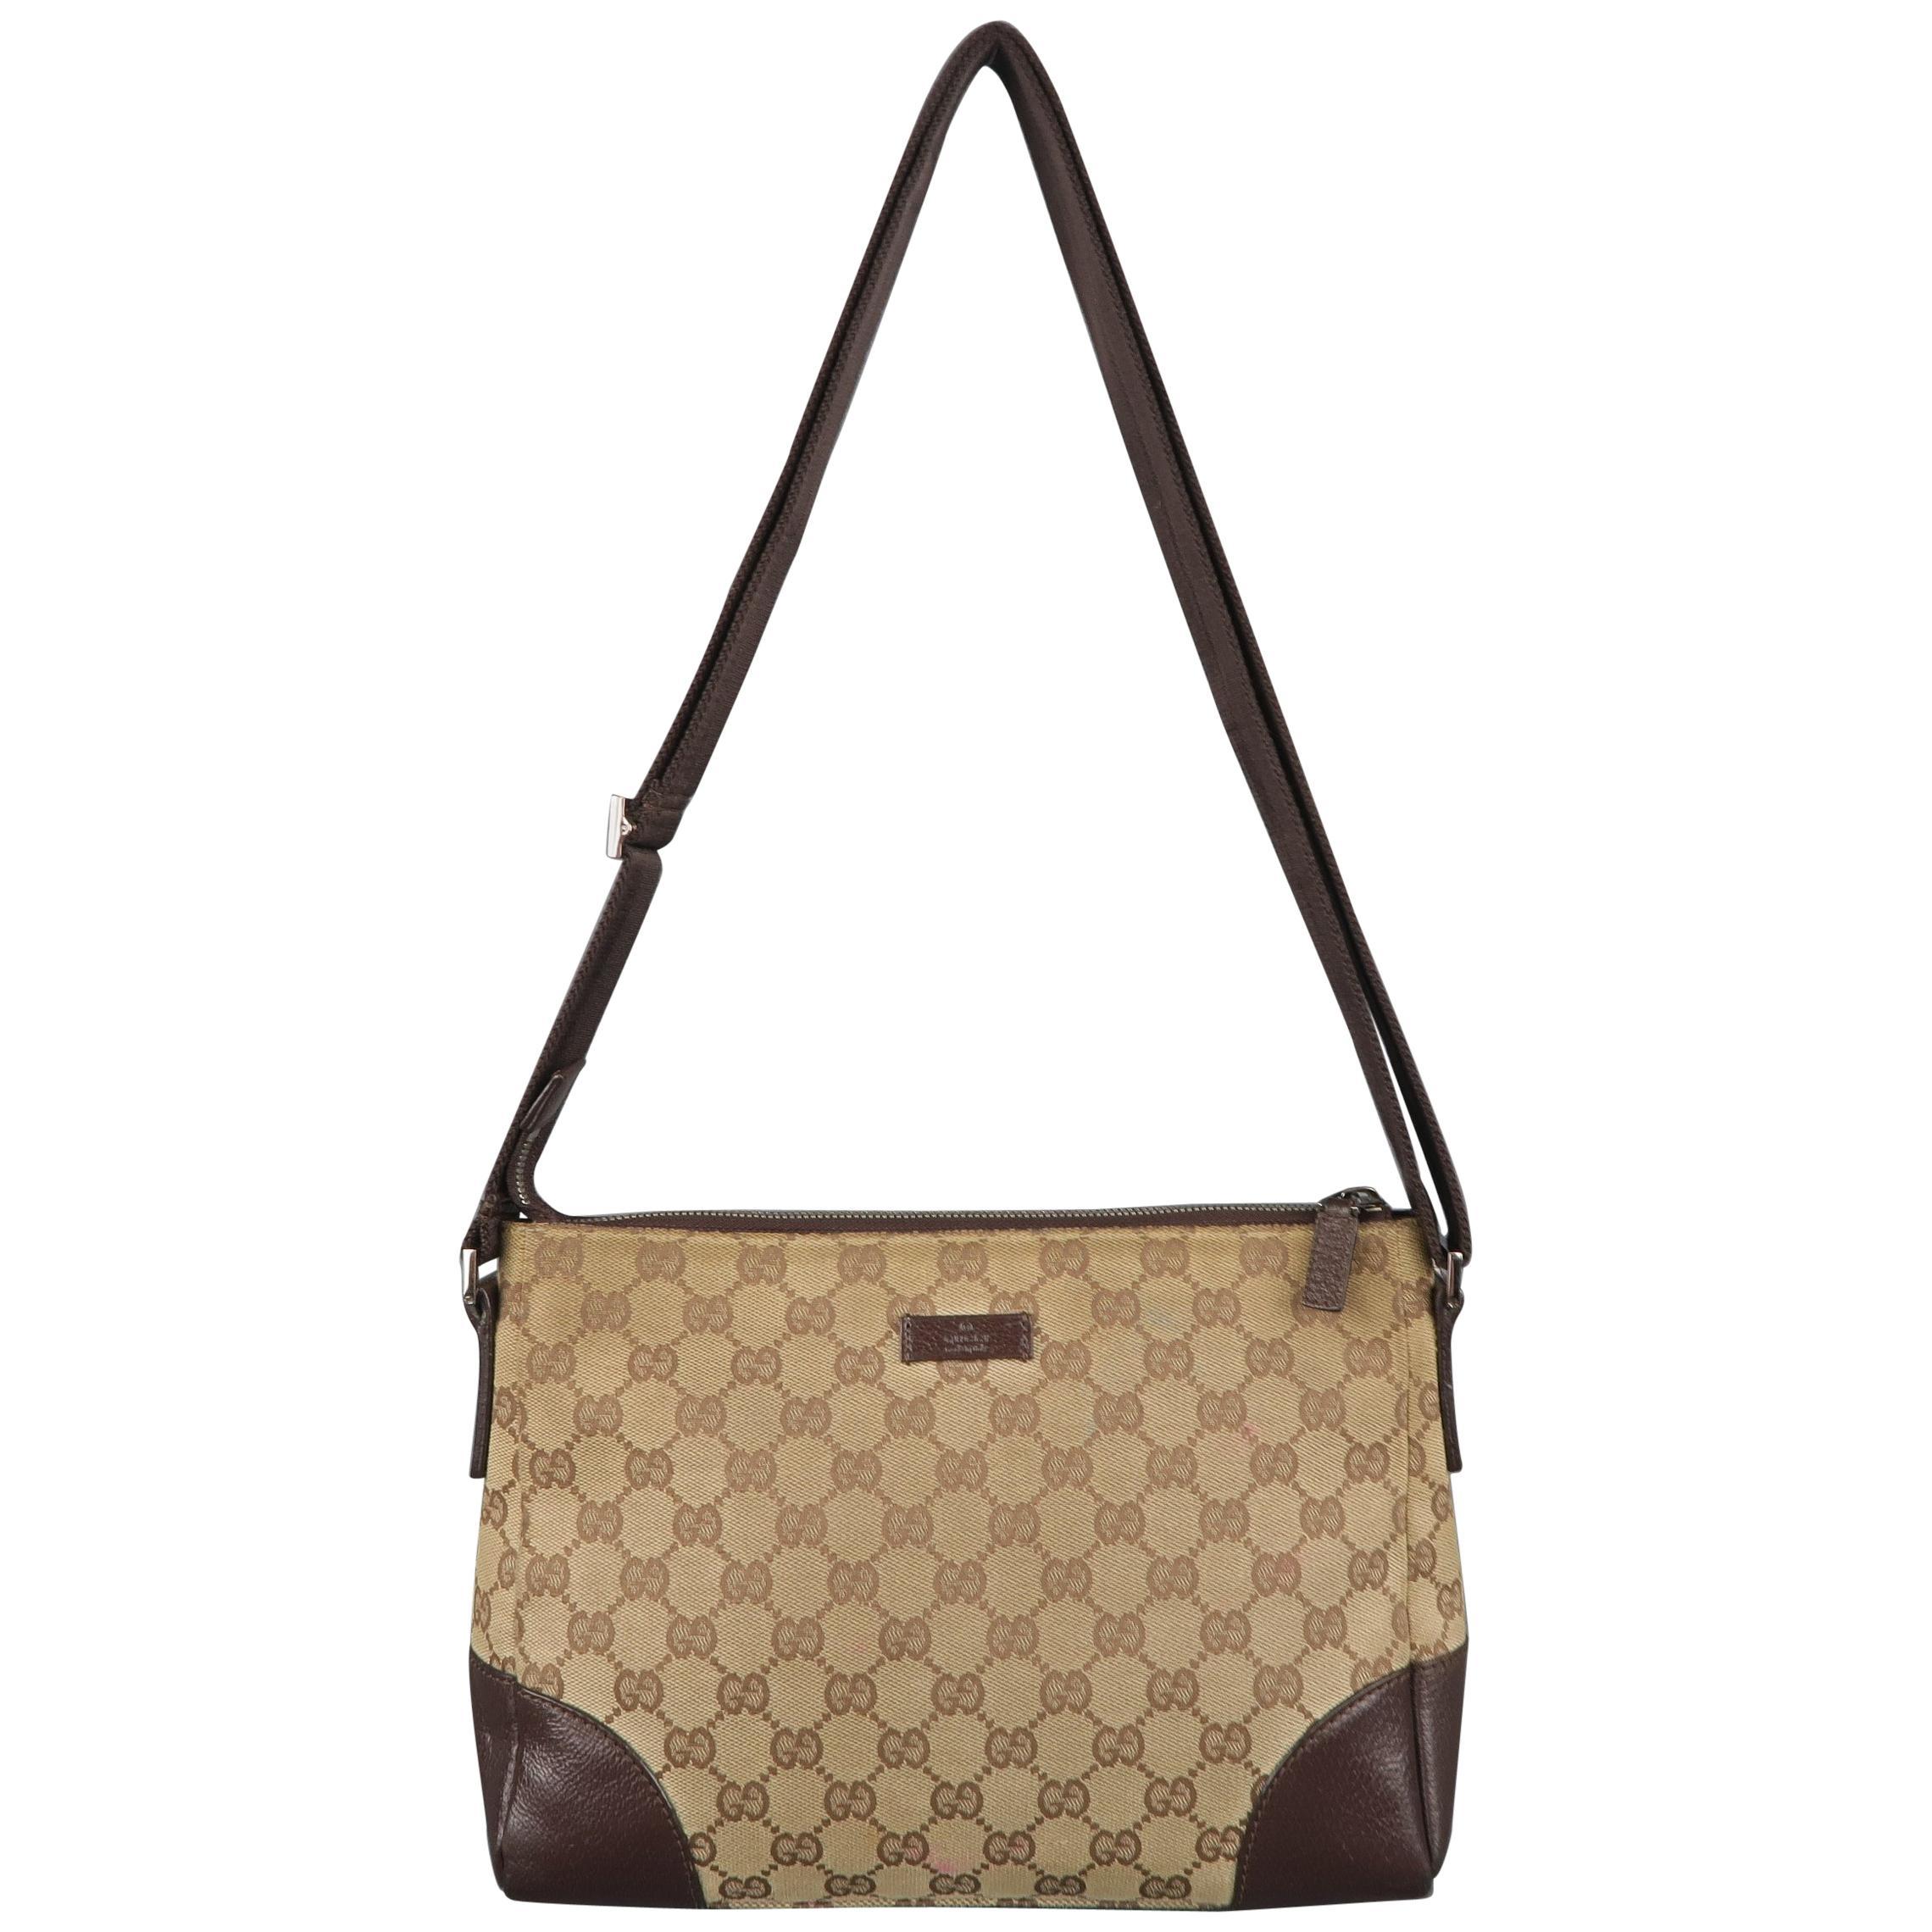 a2391819e8793a Vintage GUCCI Tan Guccissima Monogram Canvas Cross Body Handbag at 1stdibs